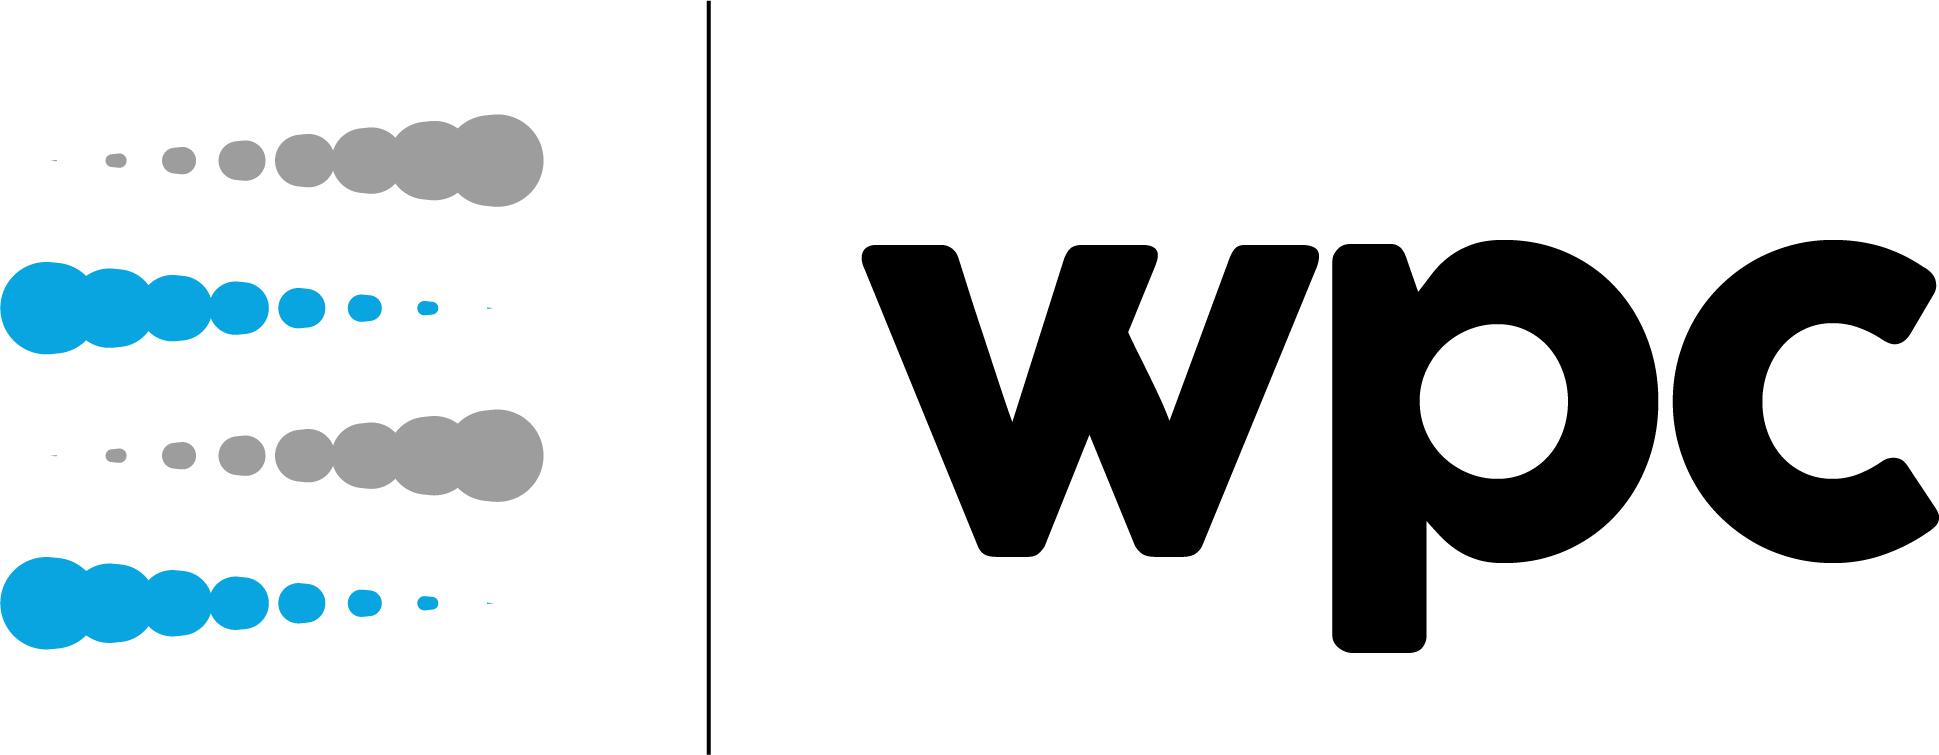 LOGO wpc 2